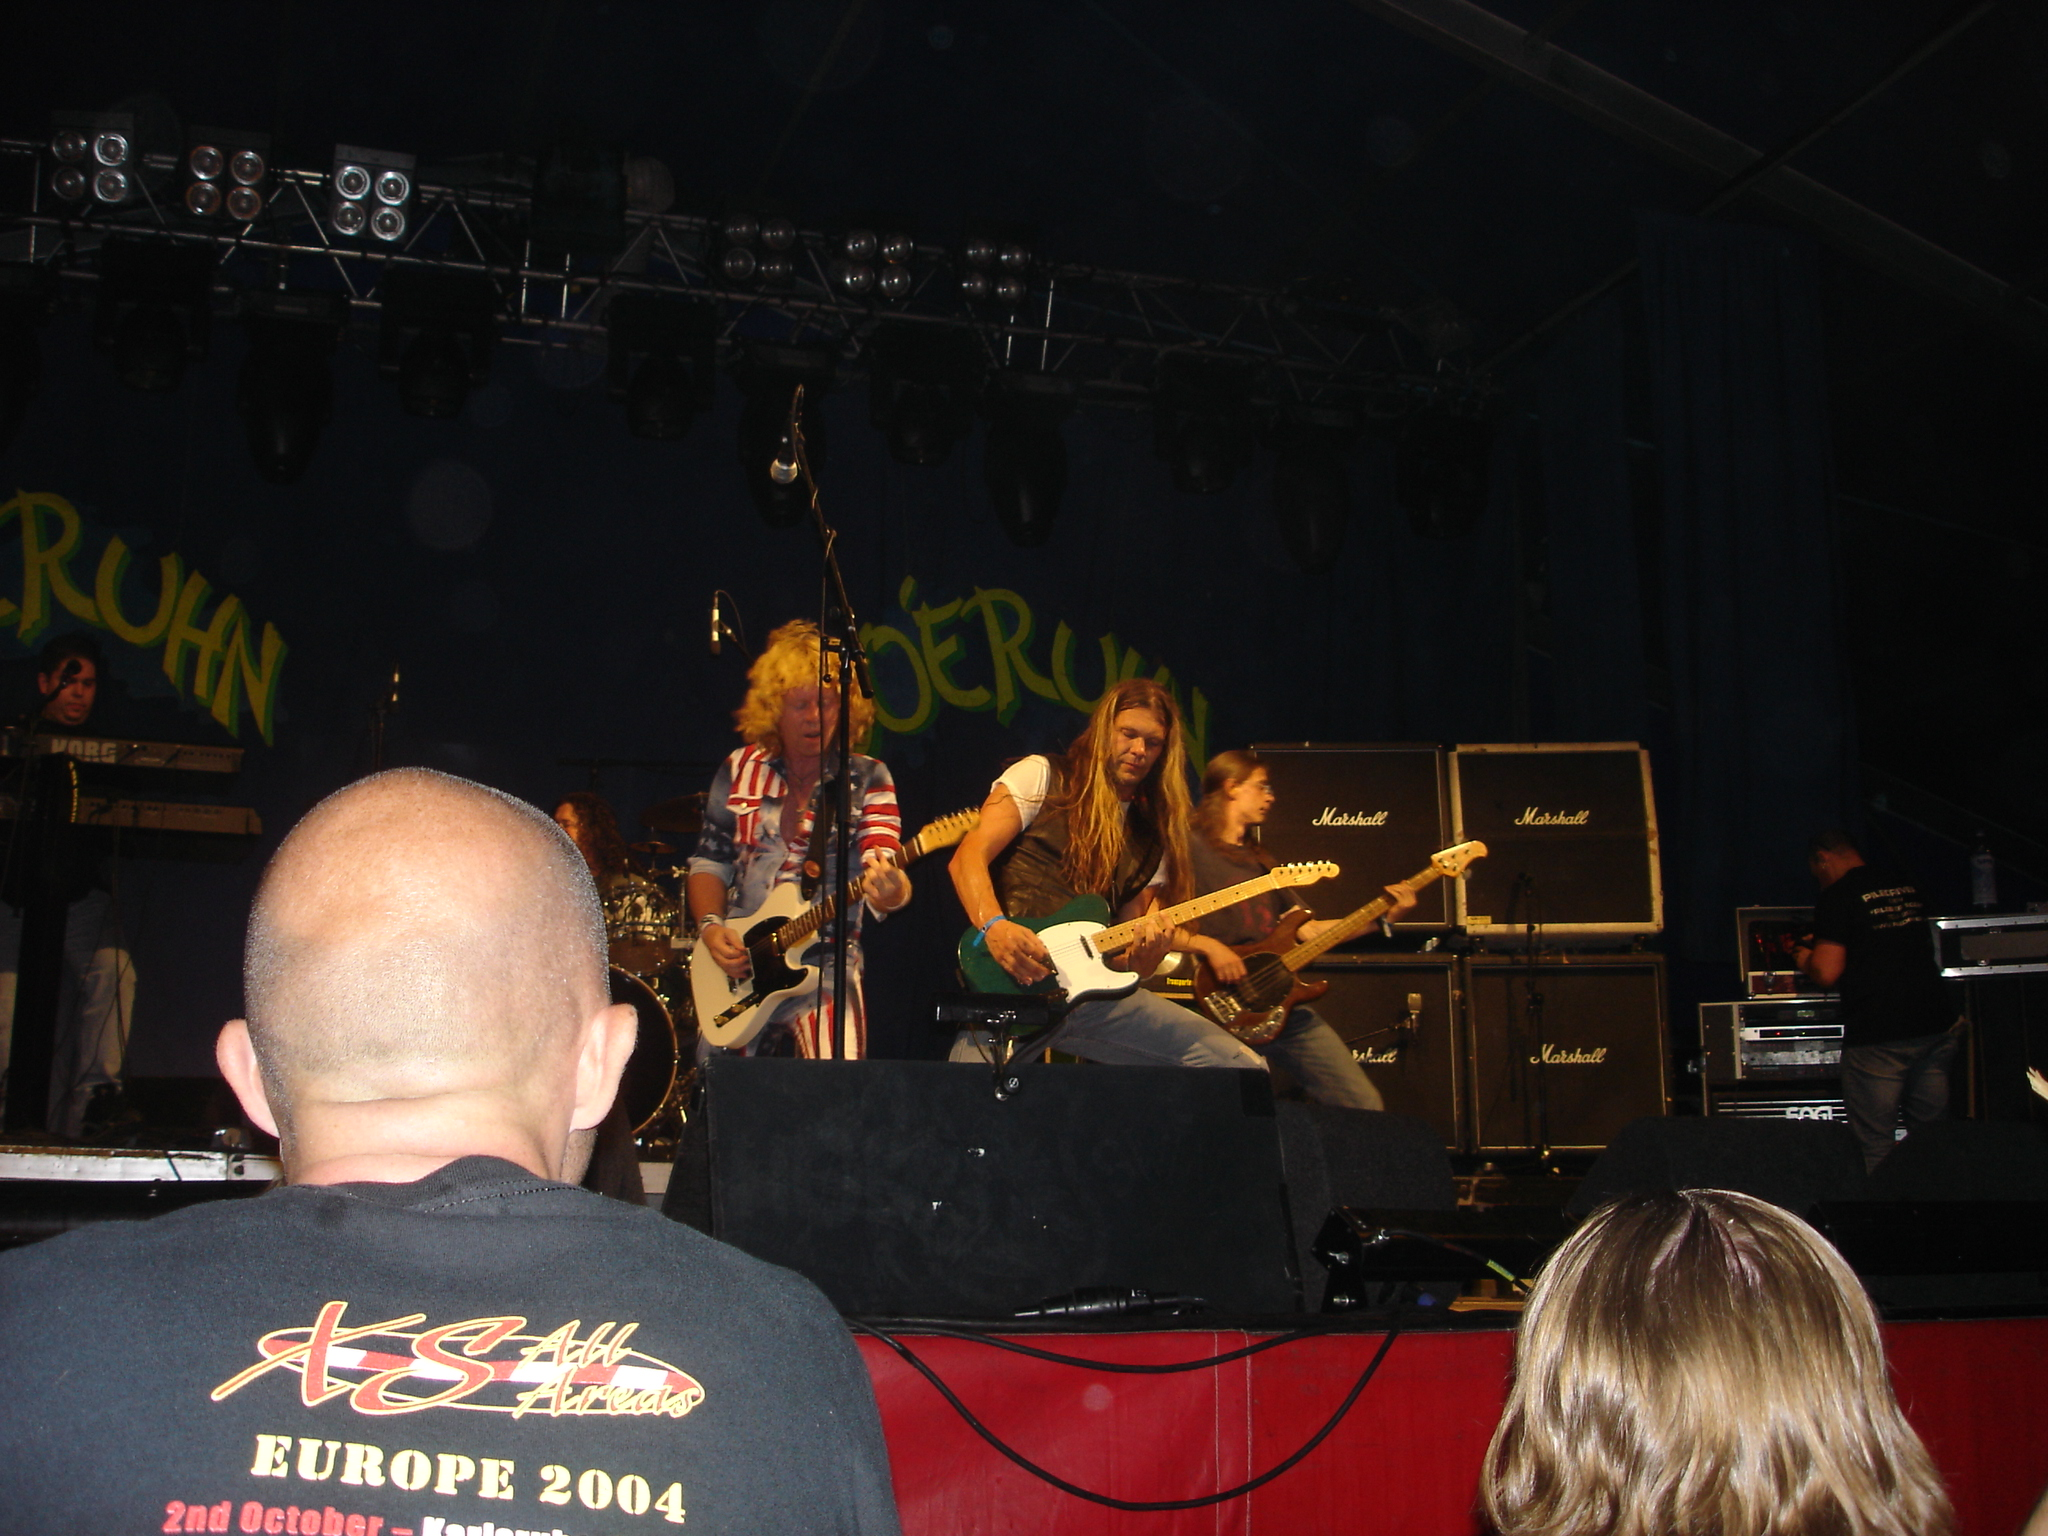 Normaal Weekend - 3.9.2005